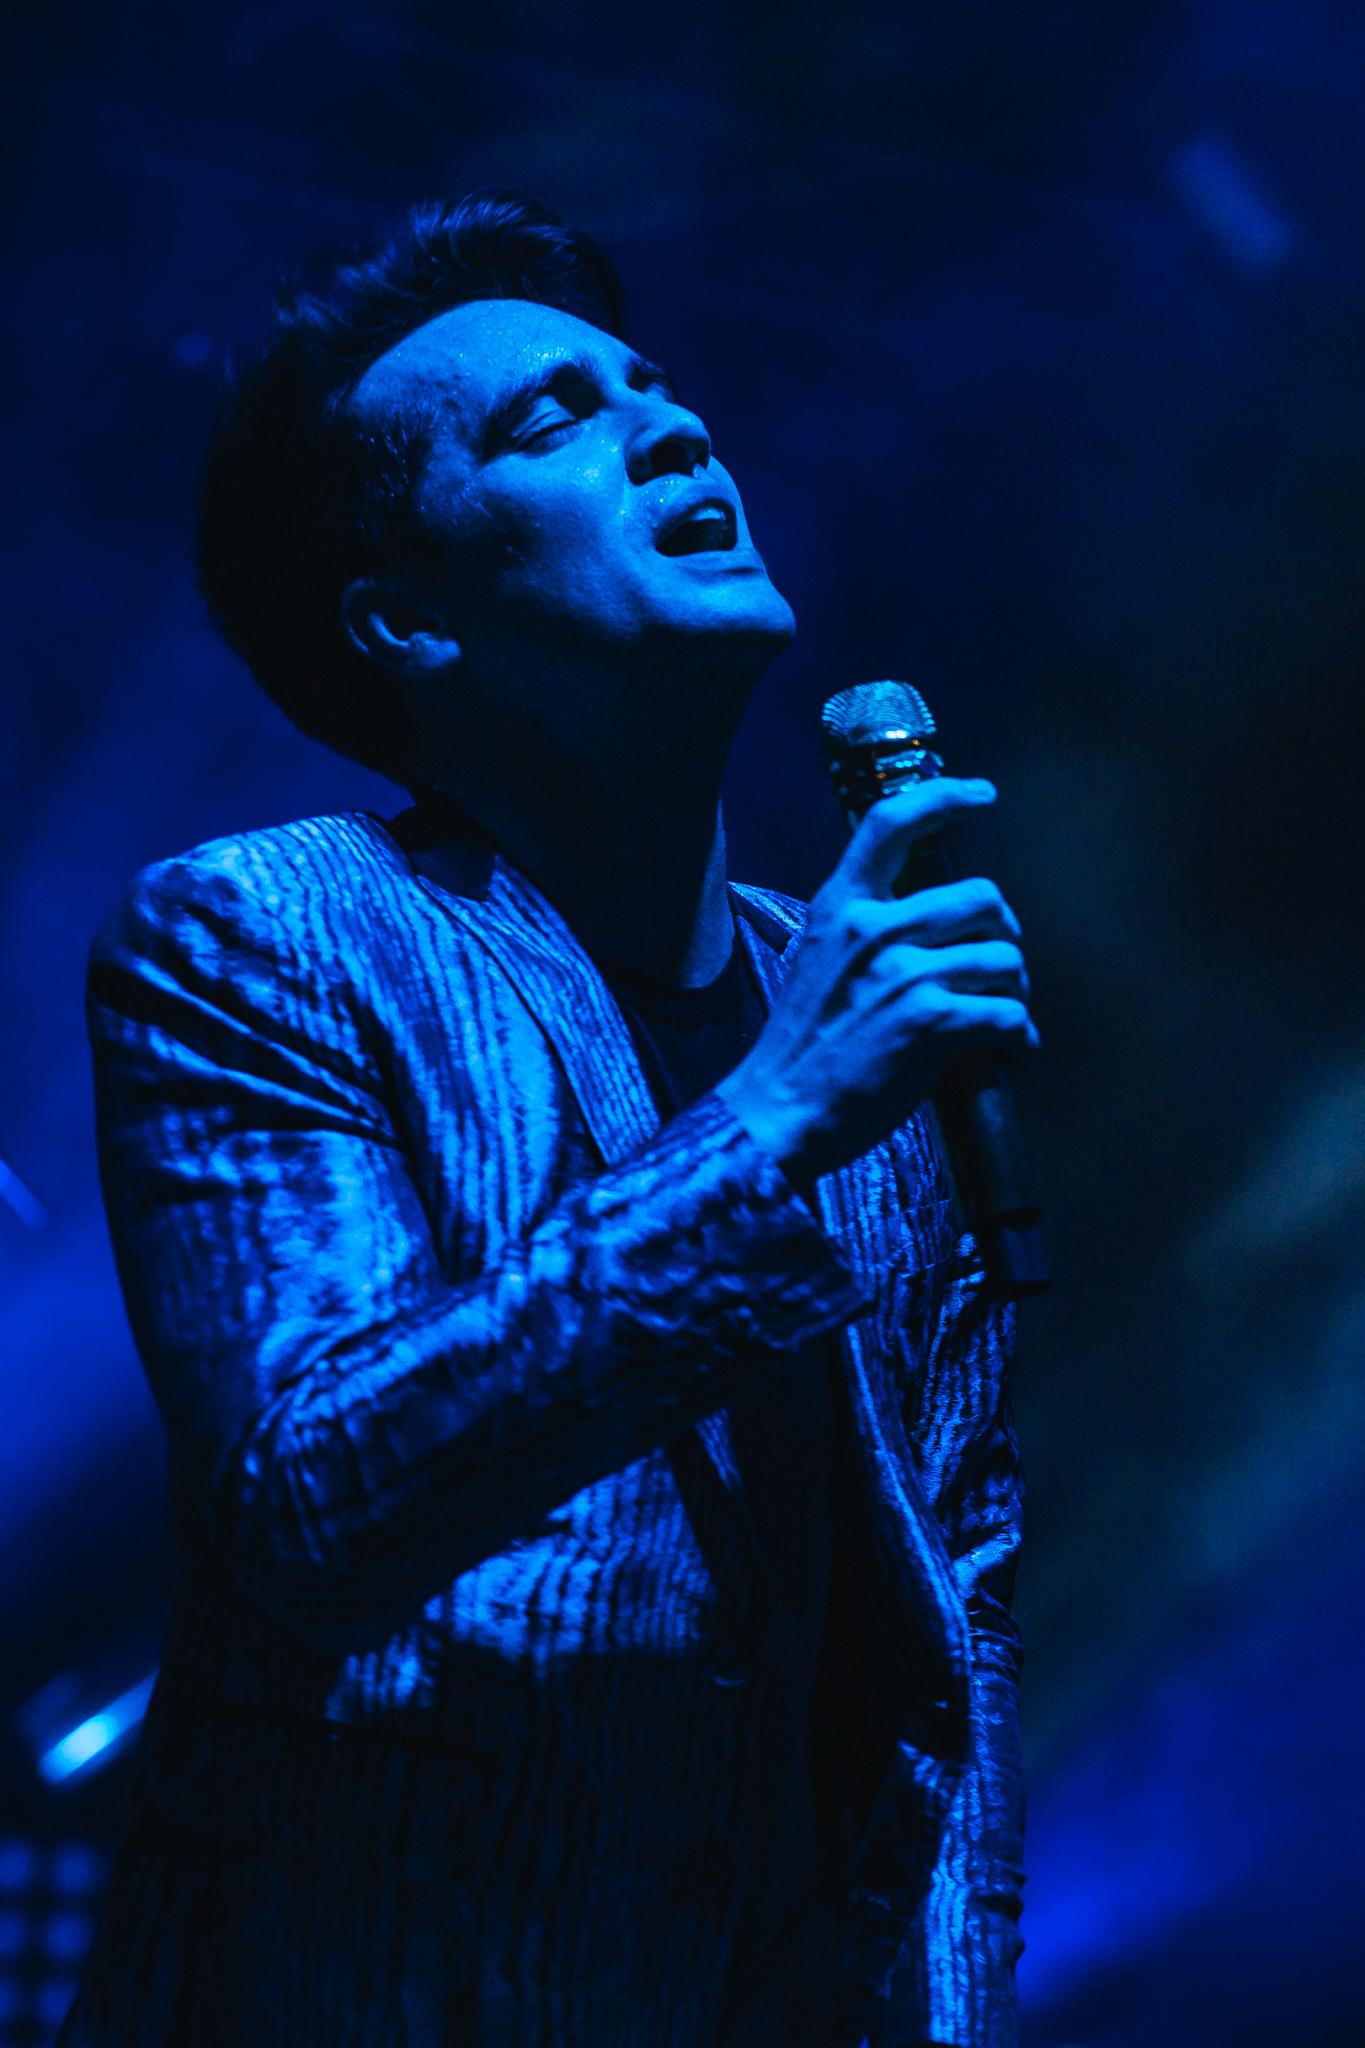 Mitch Lowe Photo - Panic At The Disco - Riverstage-49.jpg